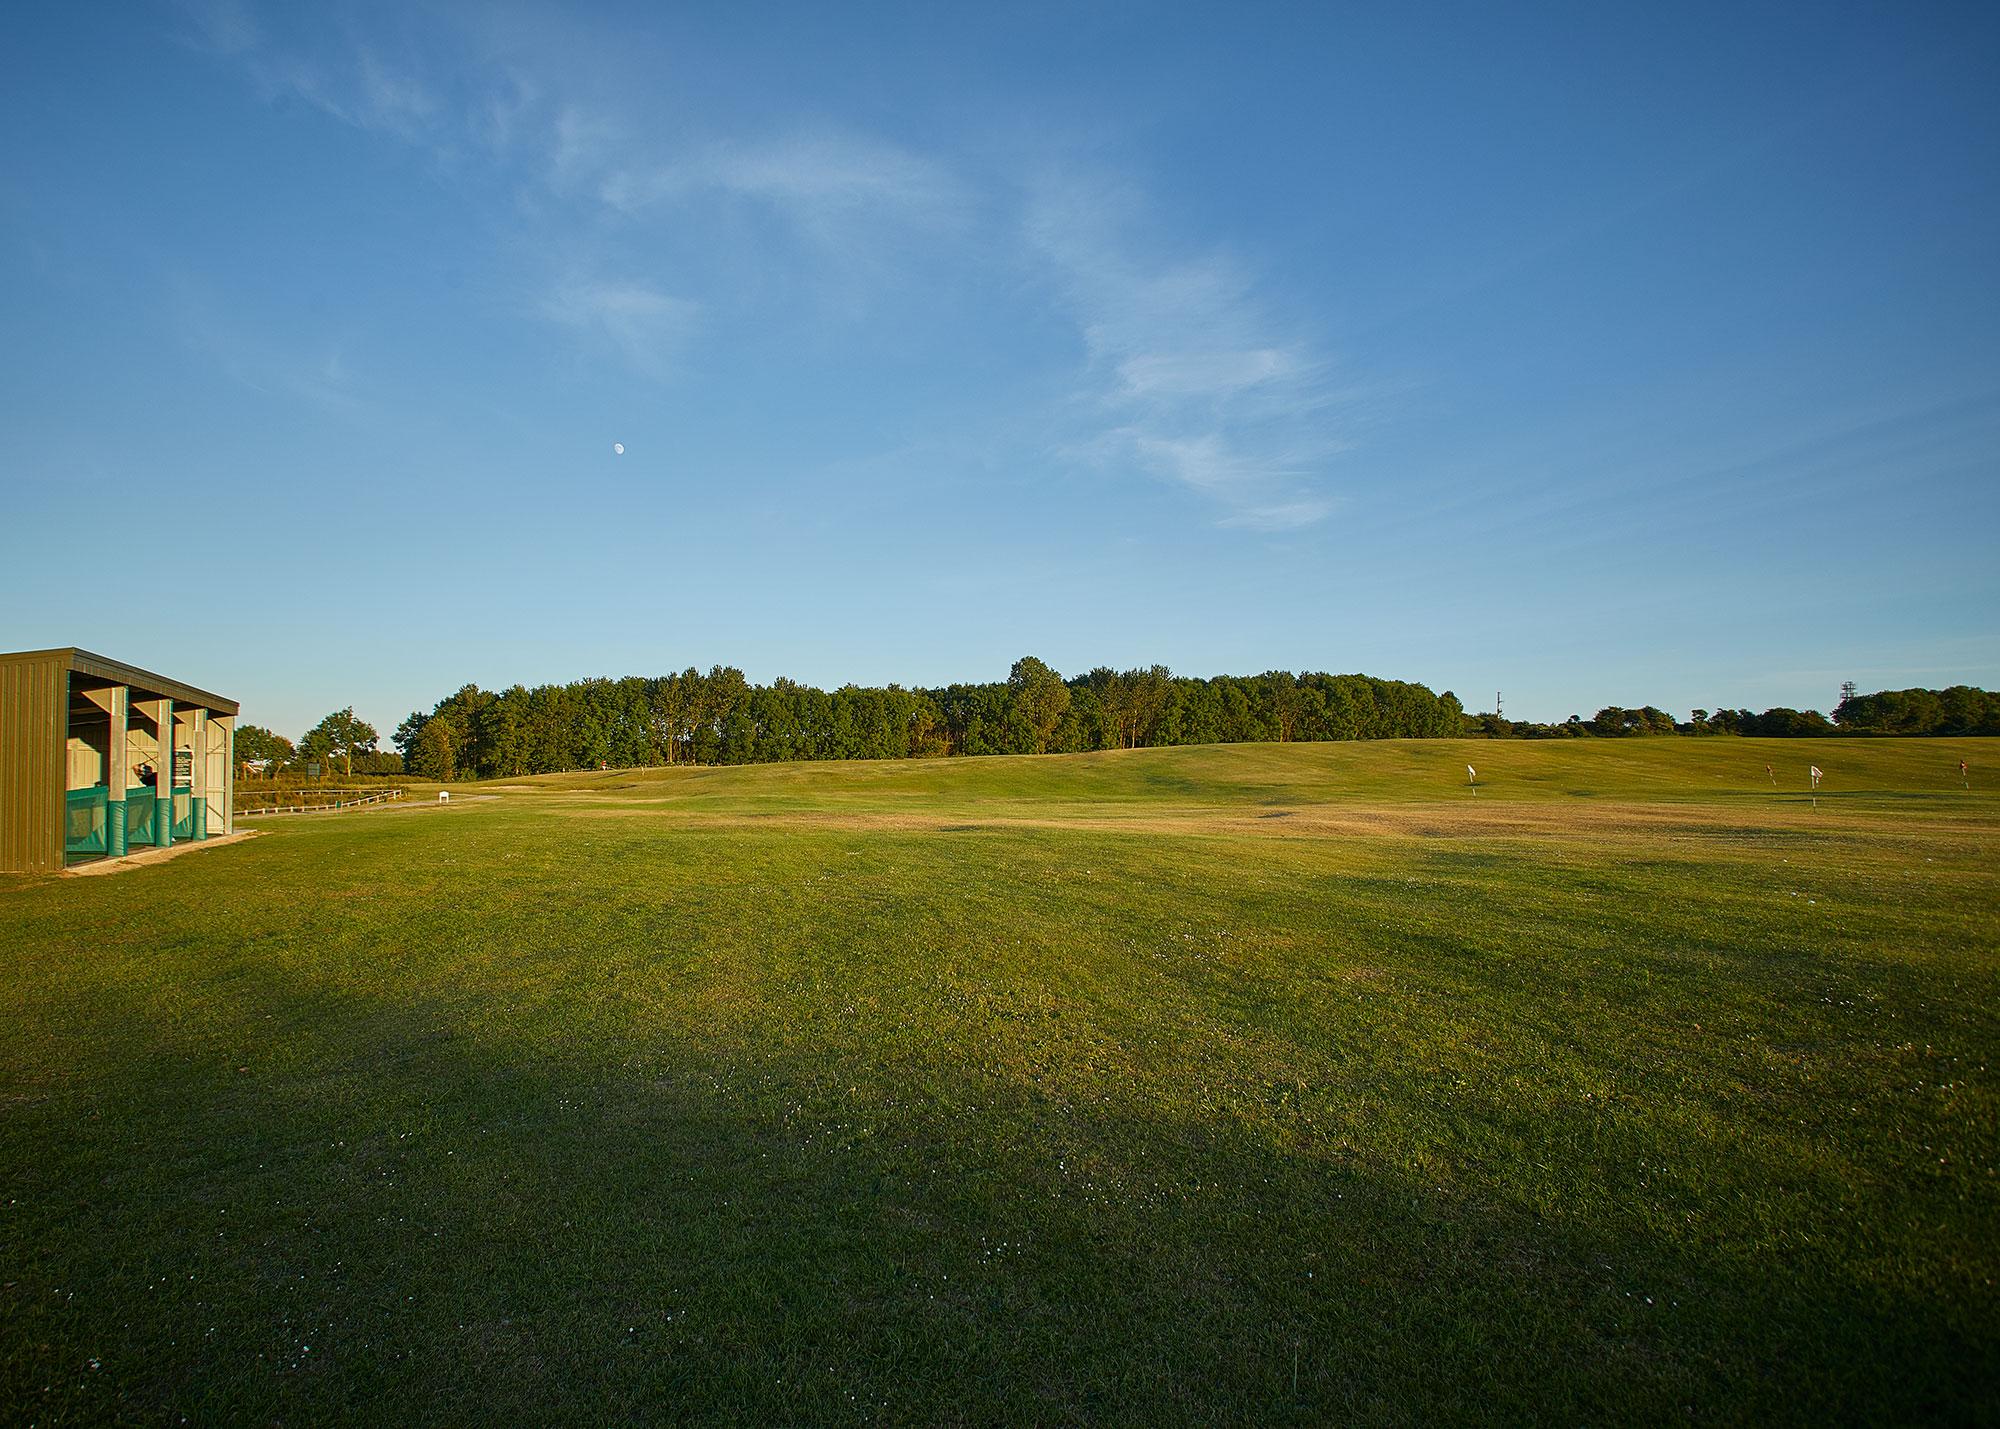 saltburn_golf_club_022-web.jpg